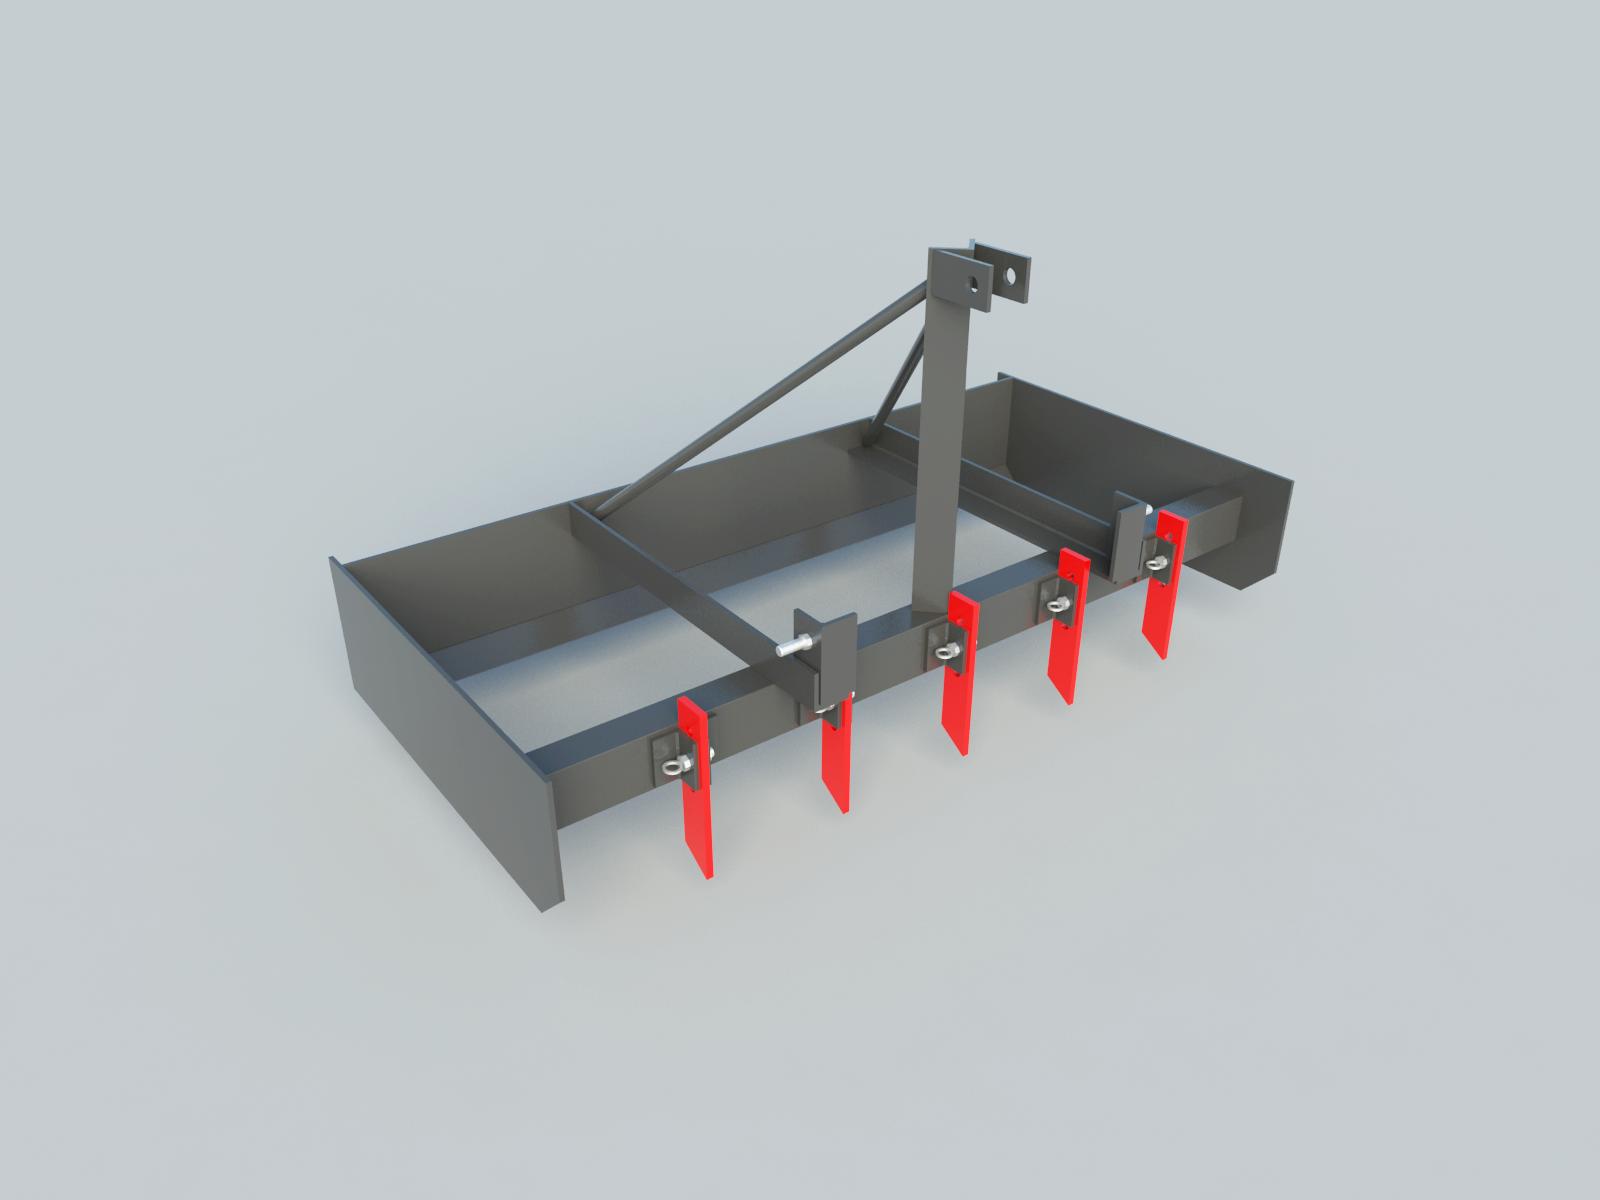 medium resolution of build your own 3pt box blade diy plans fun to build